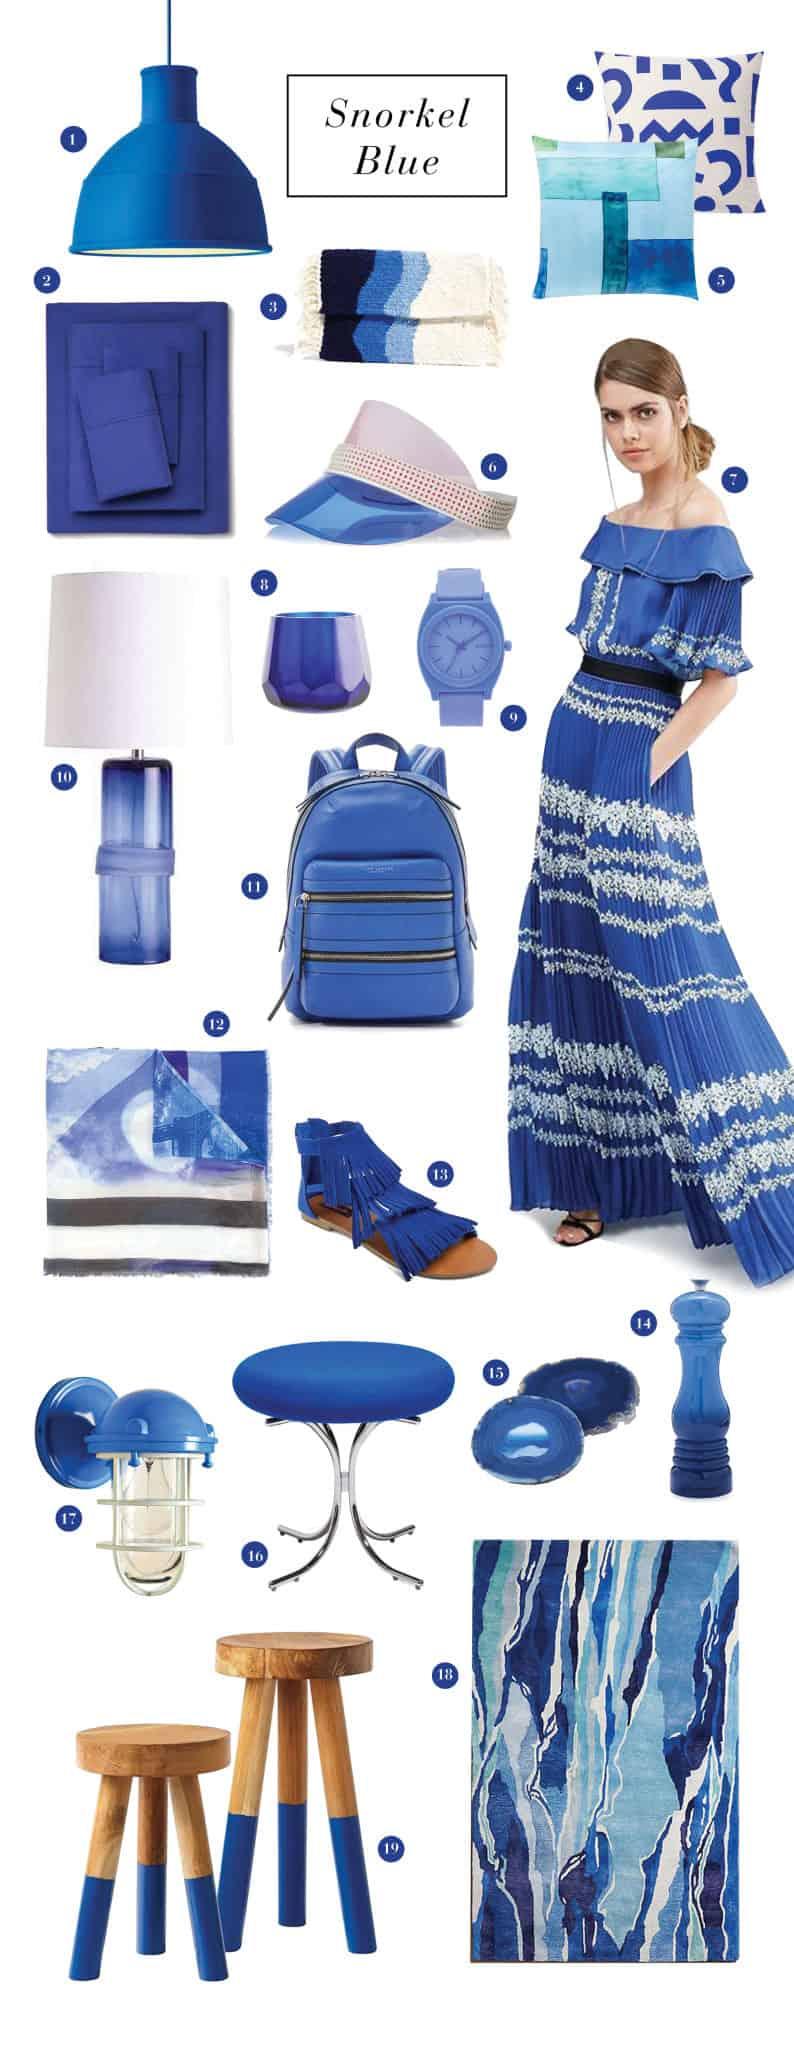 Snorkel Blue Color Trend Roundup Emily Henderson Design